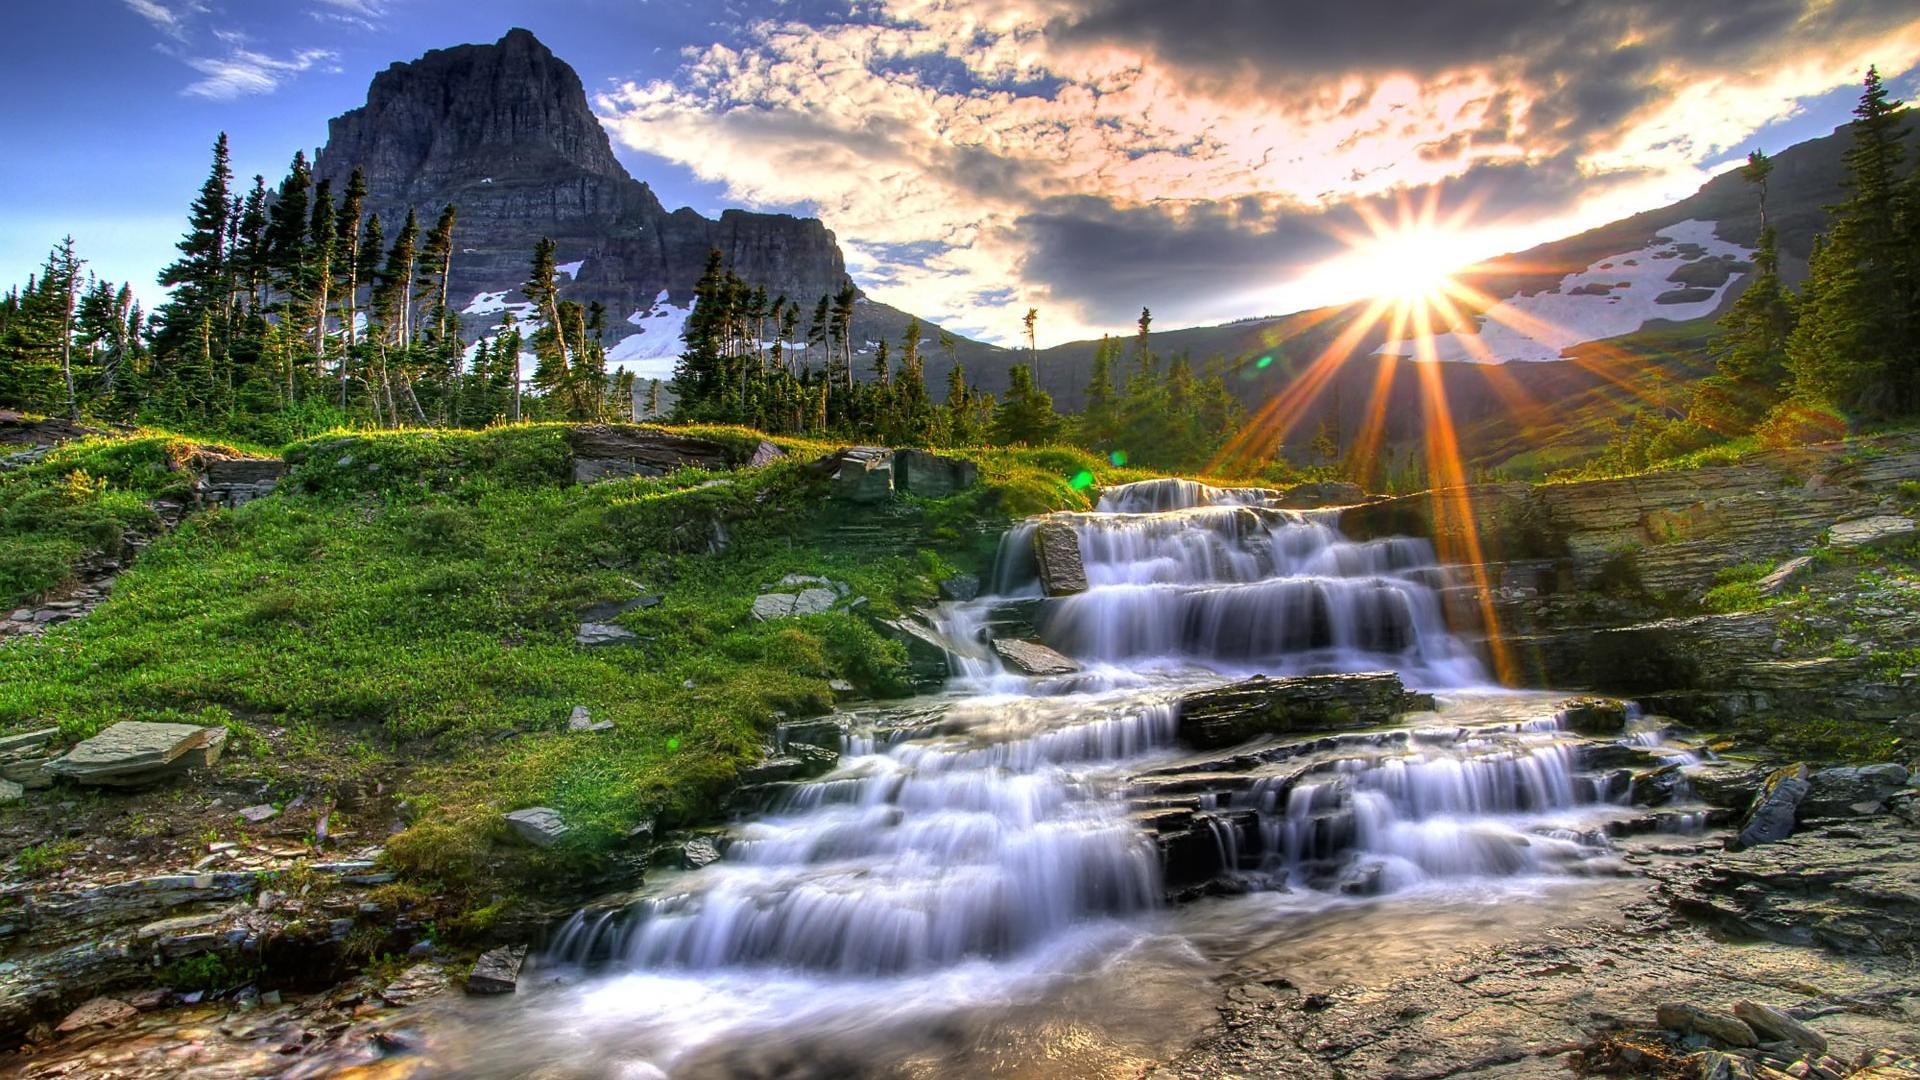 beautiful landscape nature desktop walpapers best background nature 1920x1080